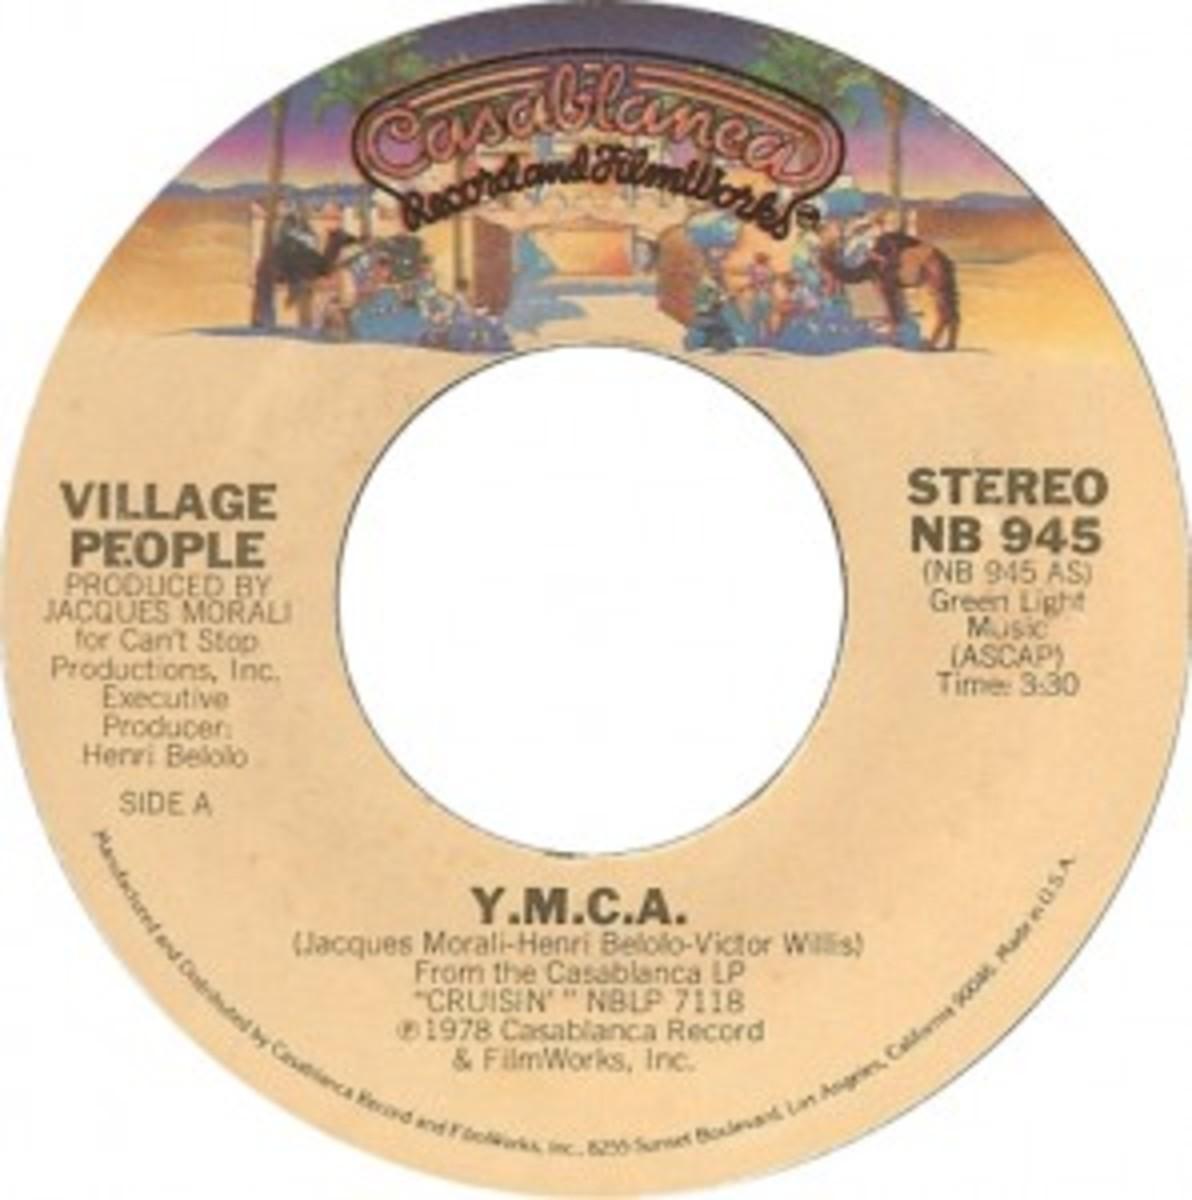 village-people-ymca-1978-12